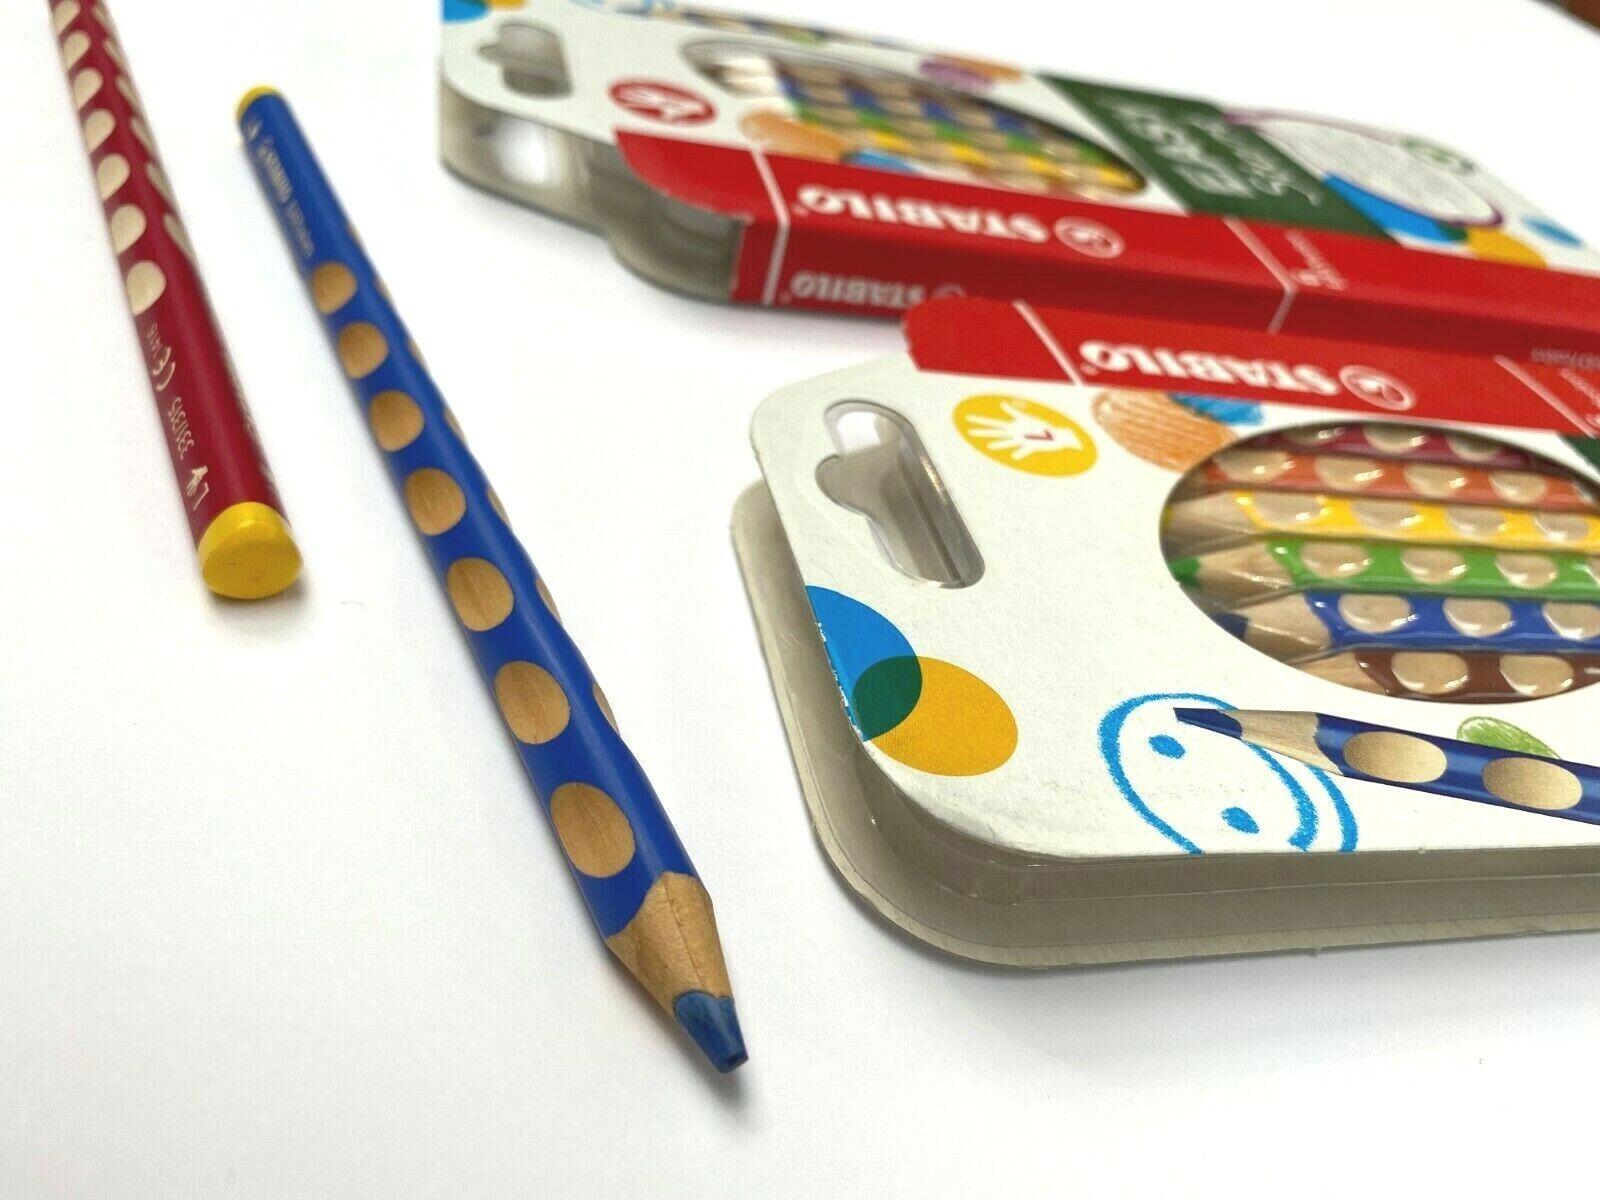 STABILO EASYcolors 6er Pack Dreikant-Buntstifte Rechtshänder Malstifte 6 Farben